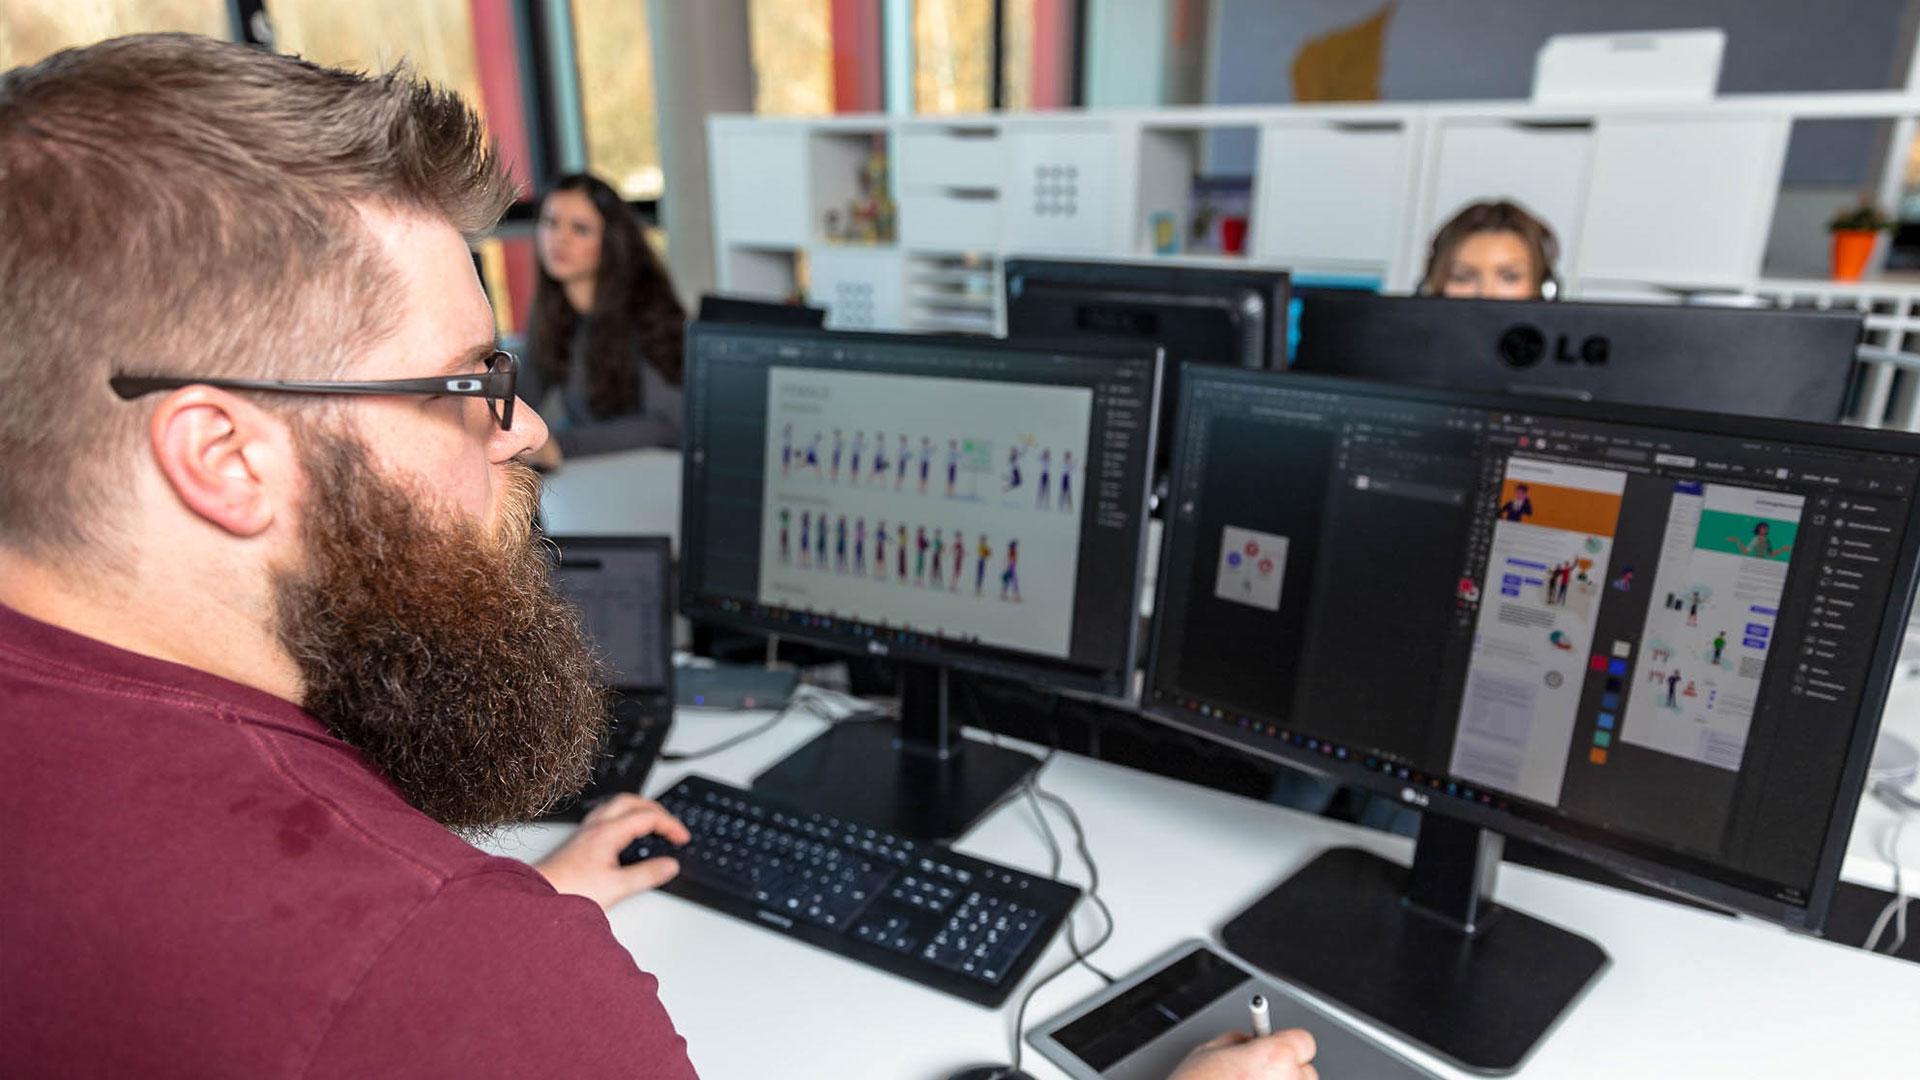 designer producing assets on computer